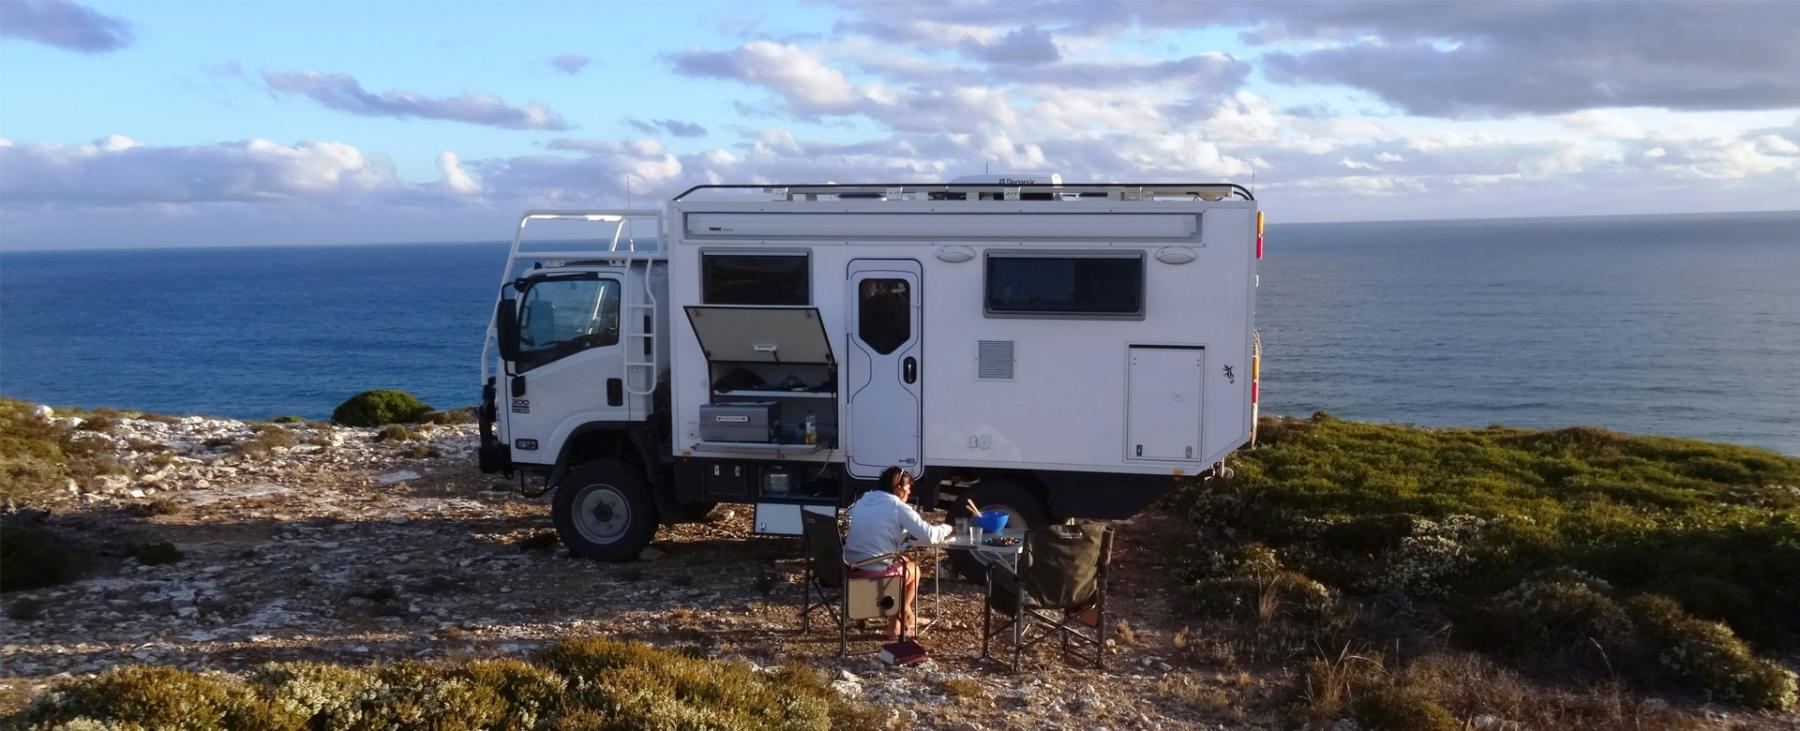 Adventurer 4x4 | Luxury 4x4 Motorhome | SLRV Expedition Vehicles